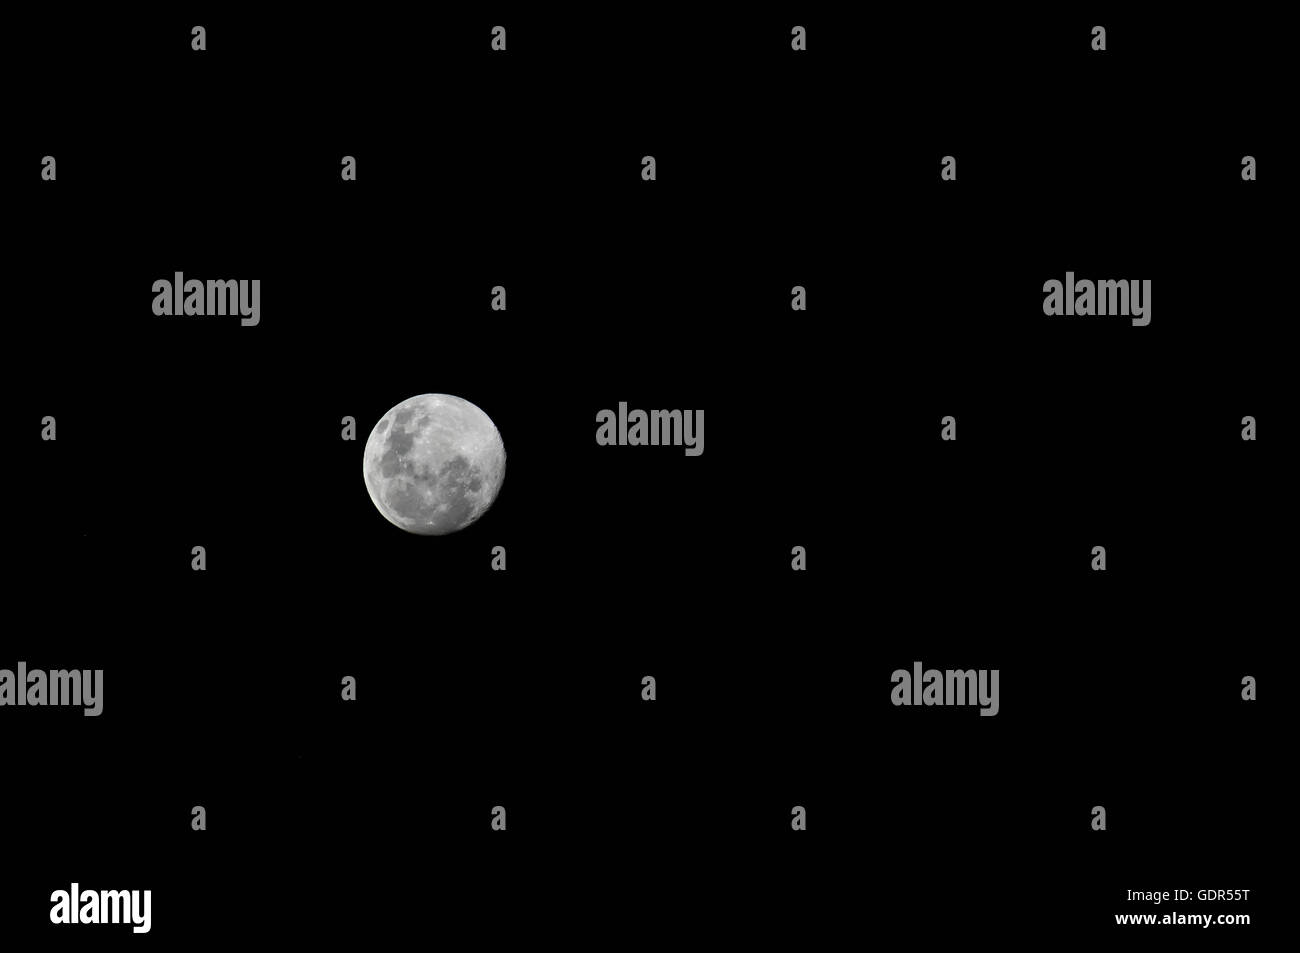 Full Moon Night Sky 2 - Stock Image